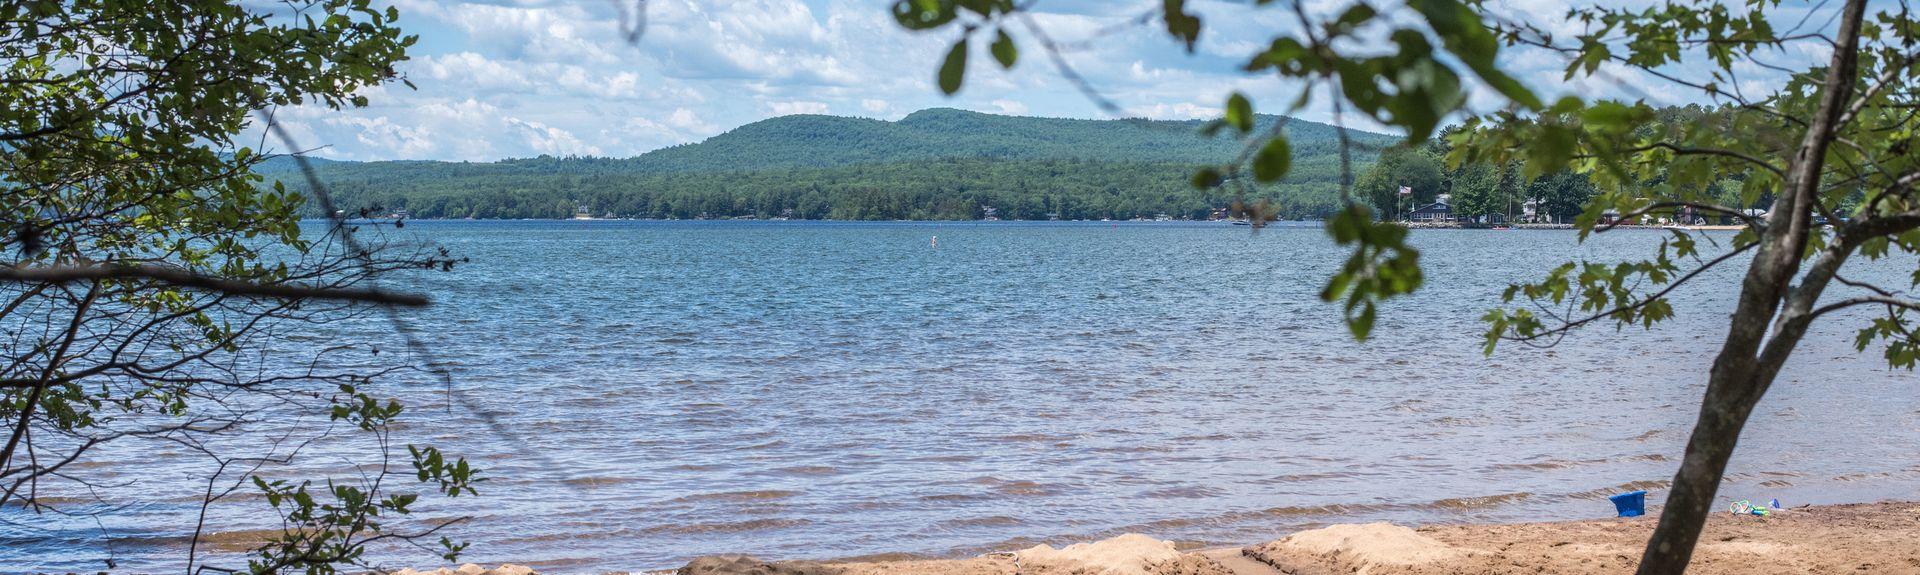 Sebago Lake, Standish, Maine, United States of America